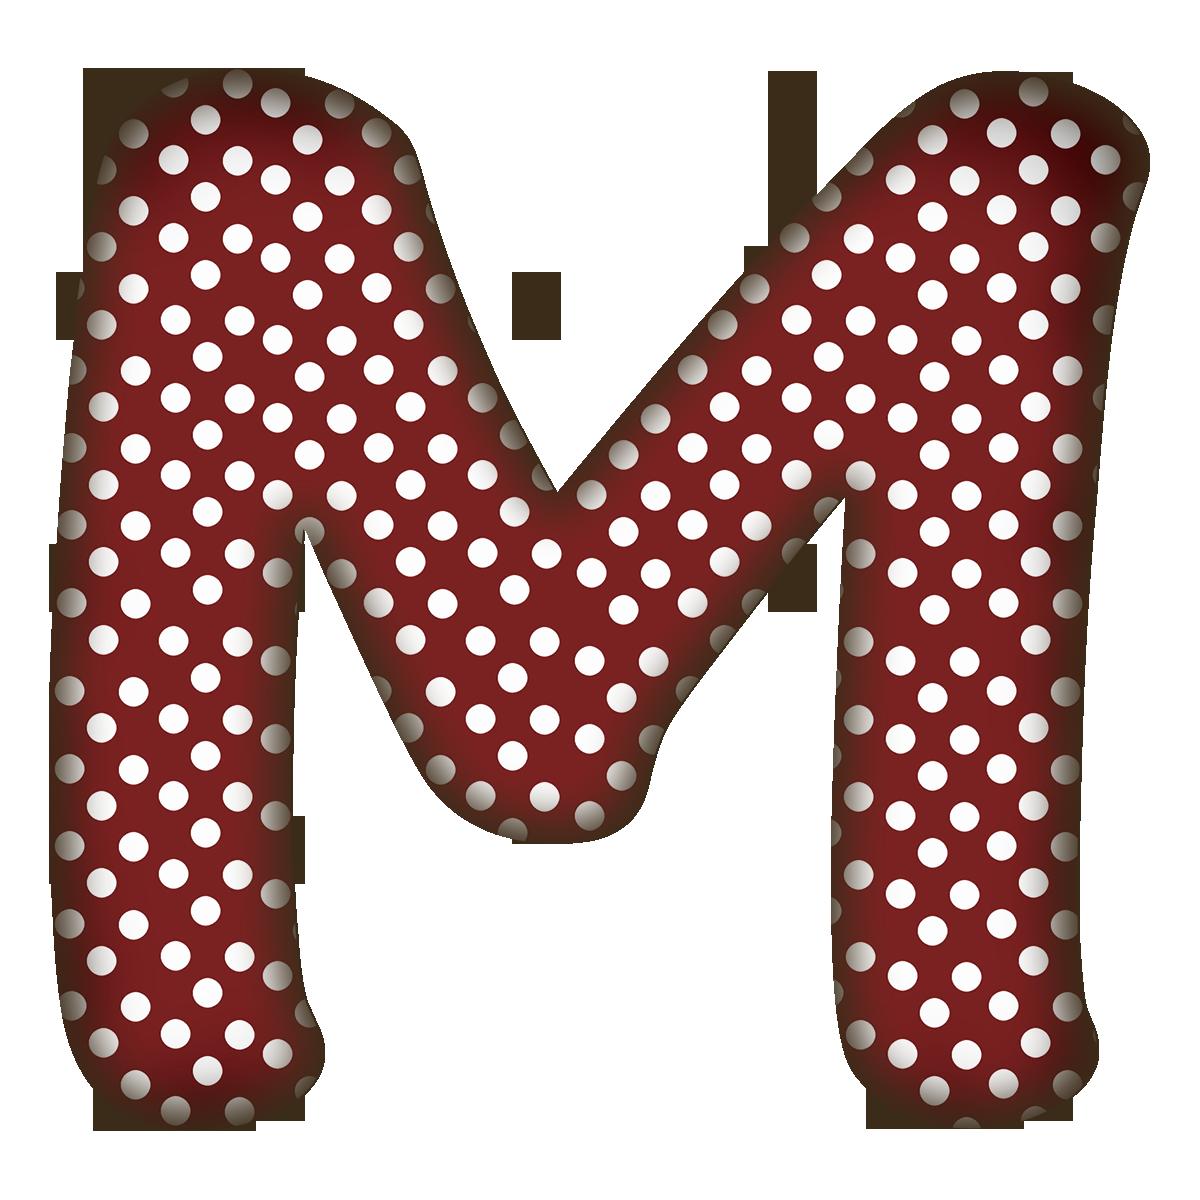 M  Letter M - Dr. Odd